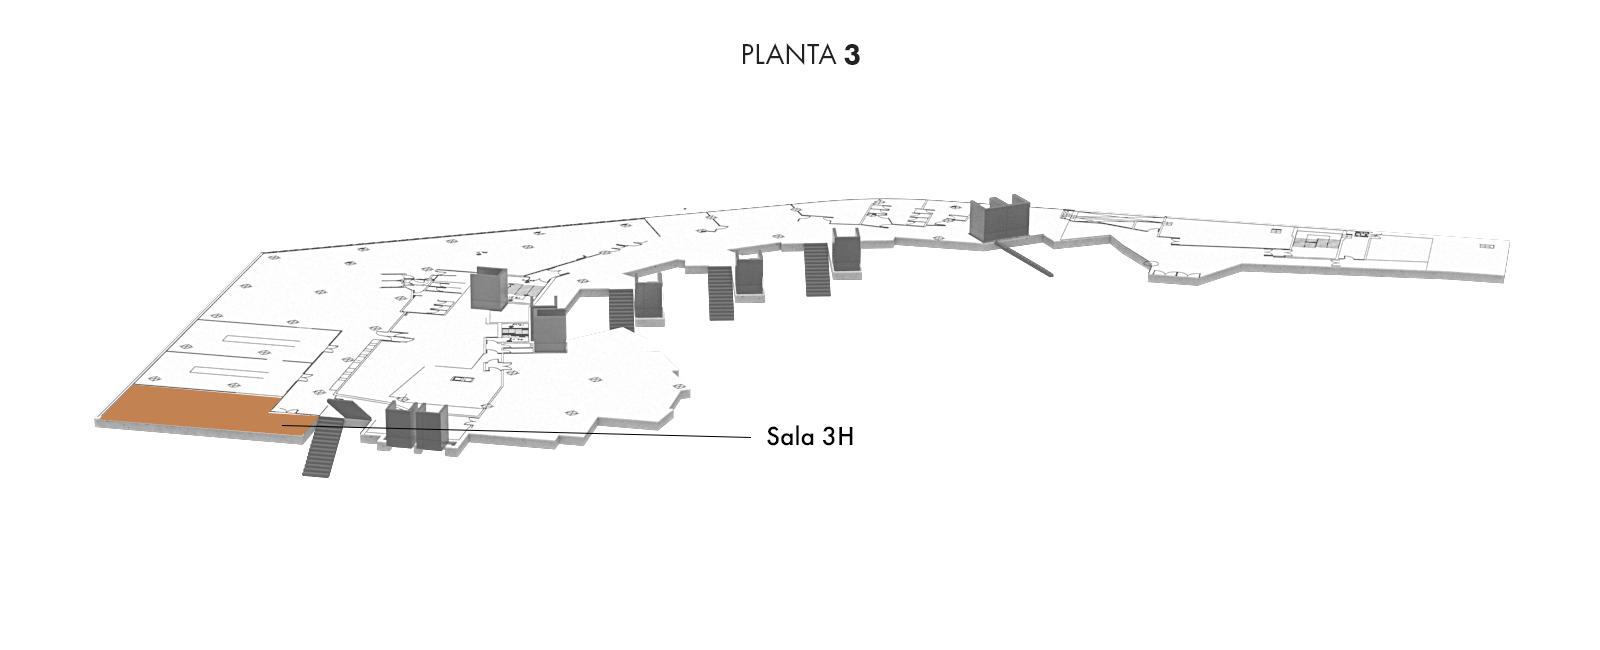 Sala 3H, Planta 3   Palacio Euskalduna Jauregia